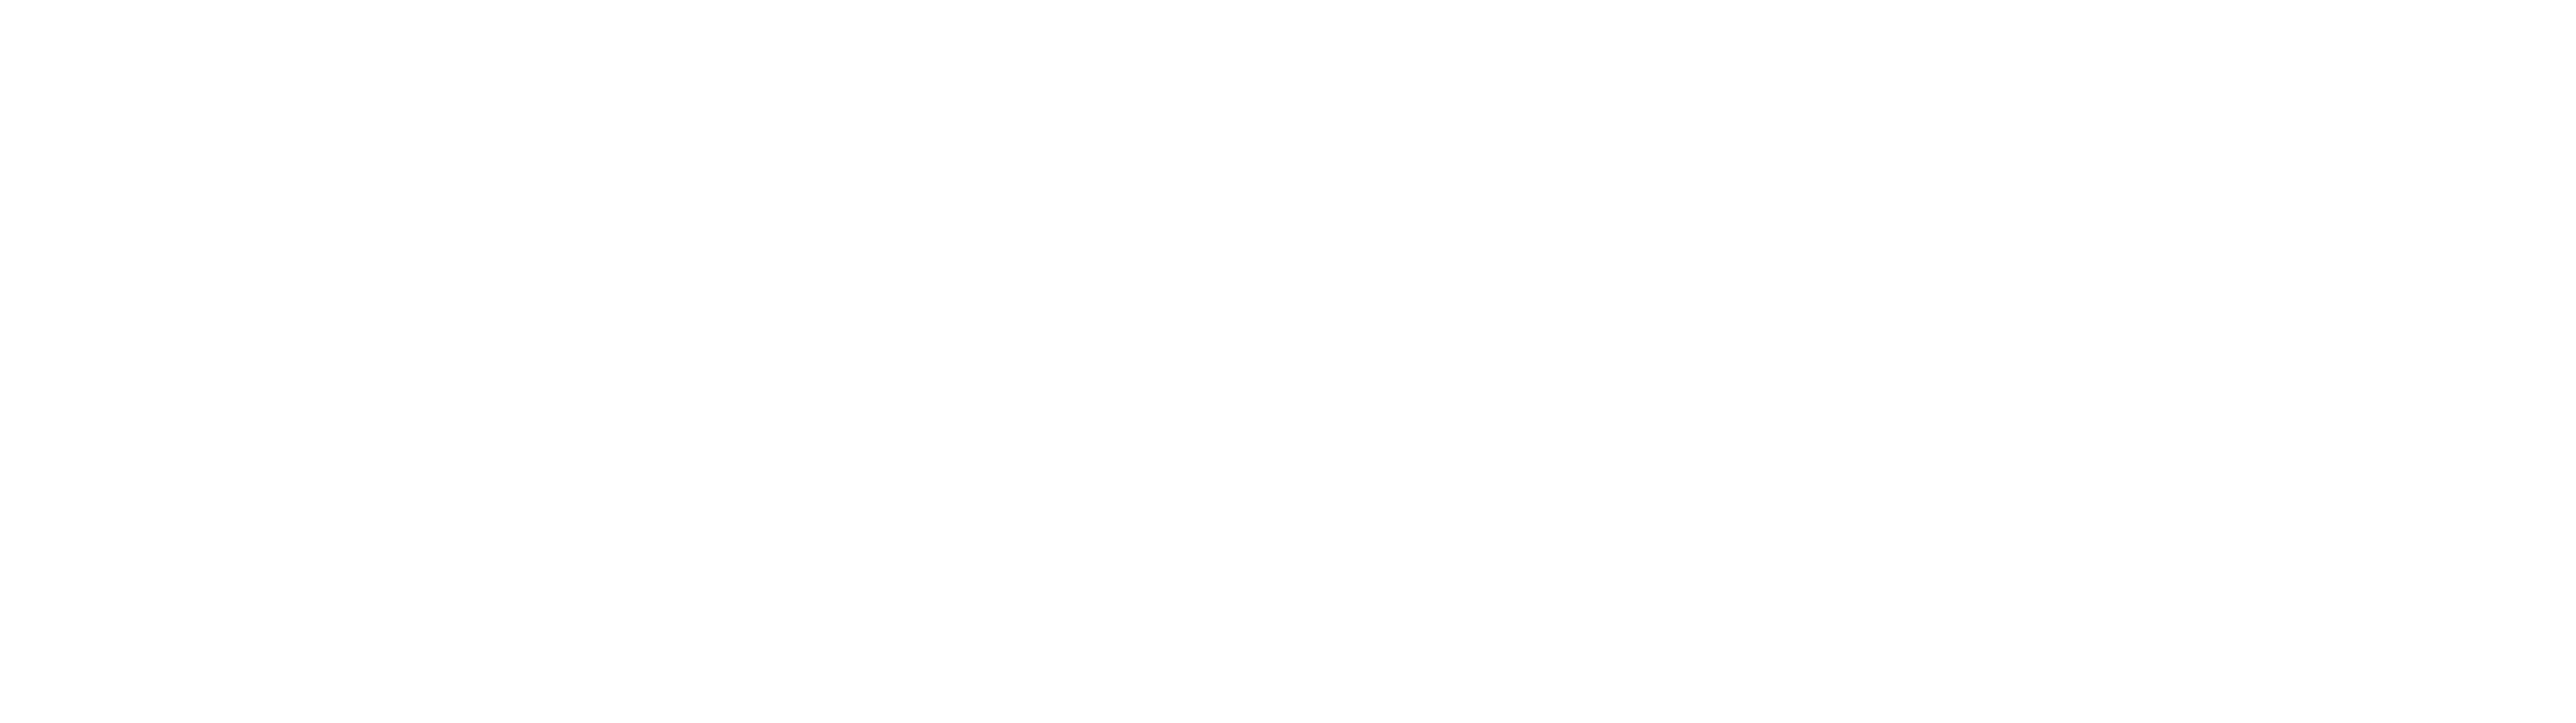 Growpirate logo wit